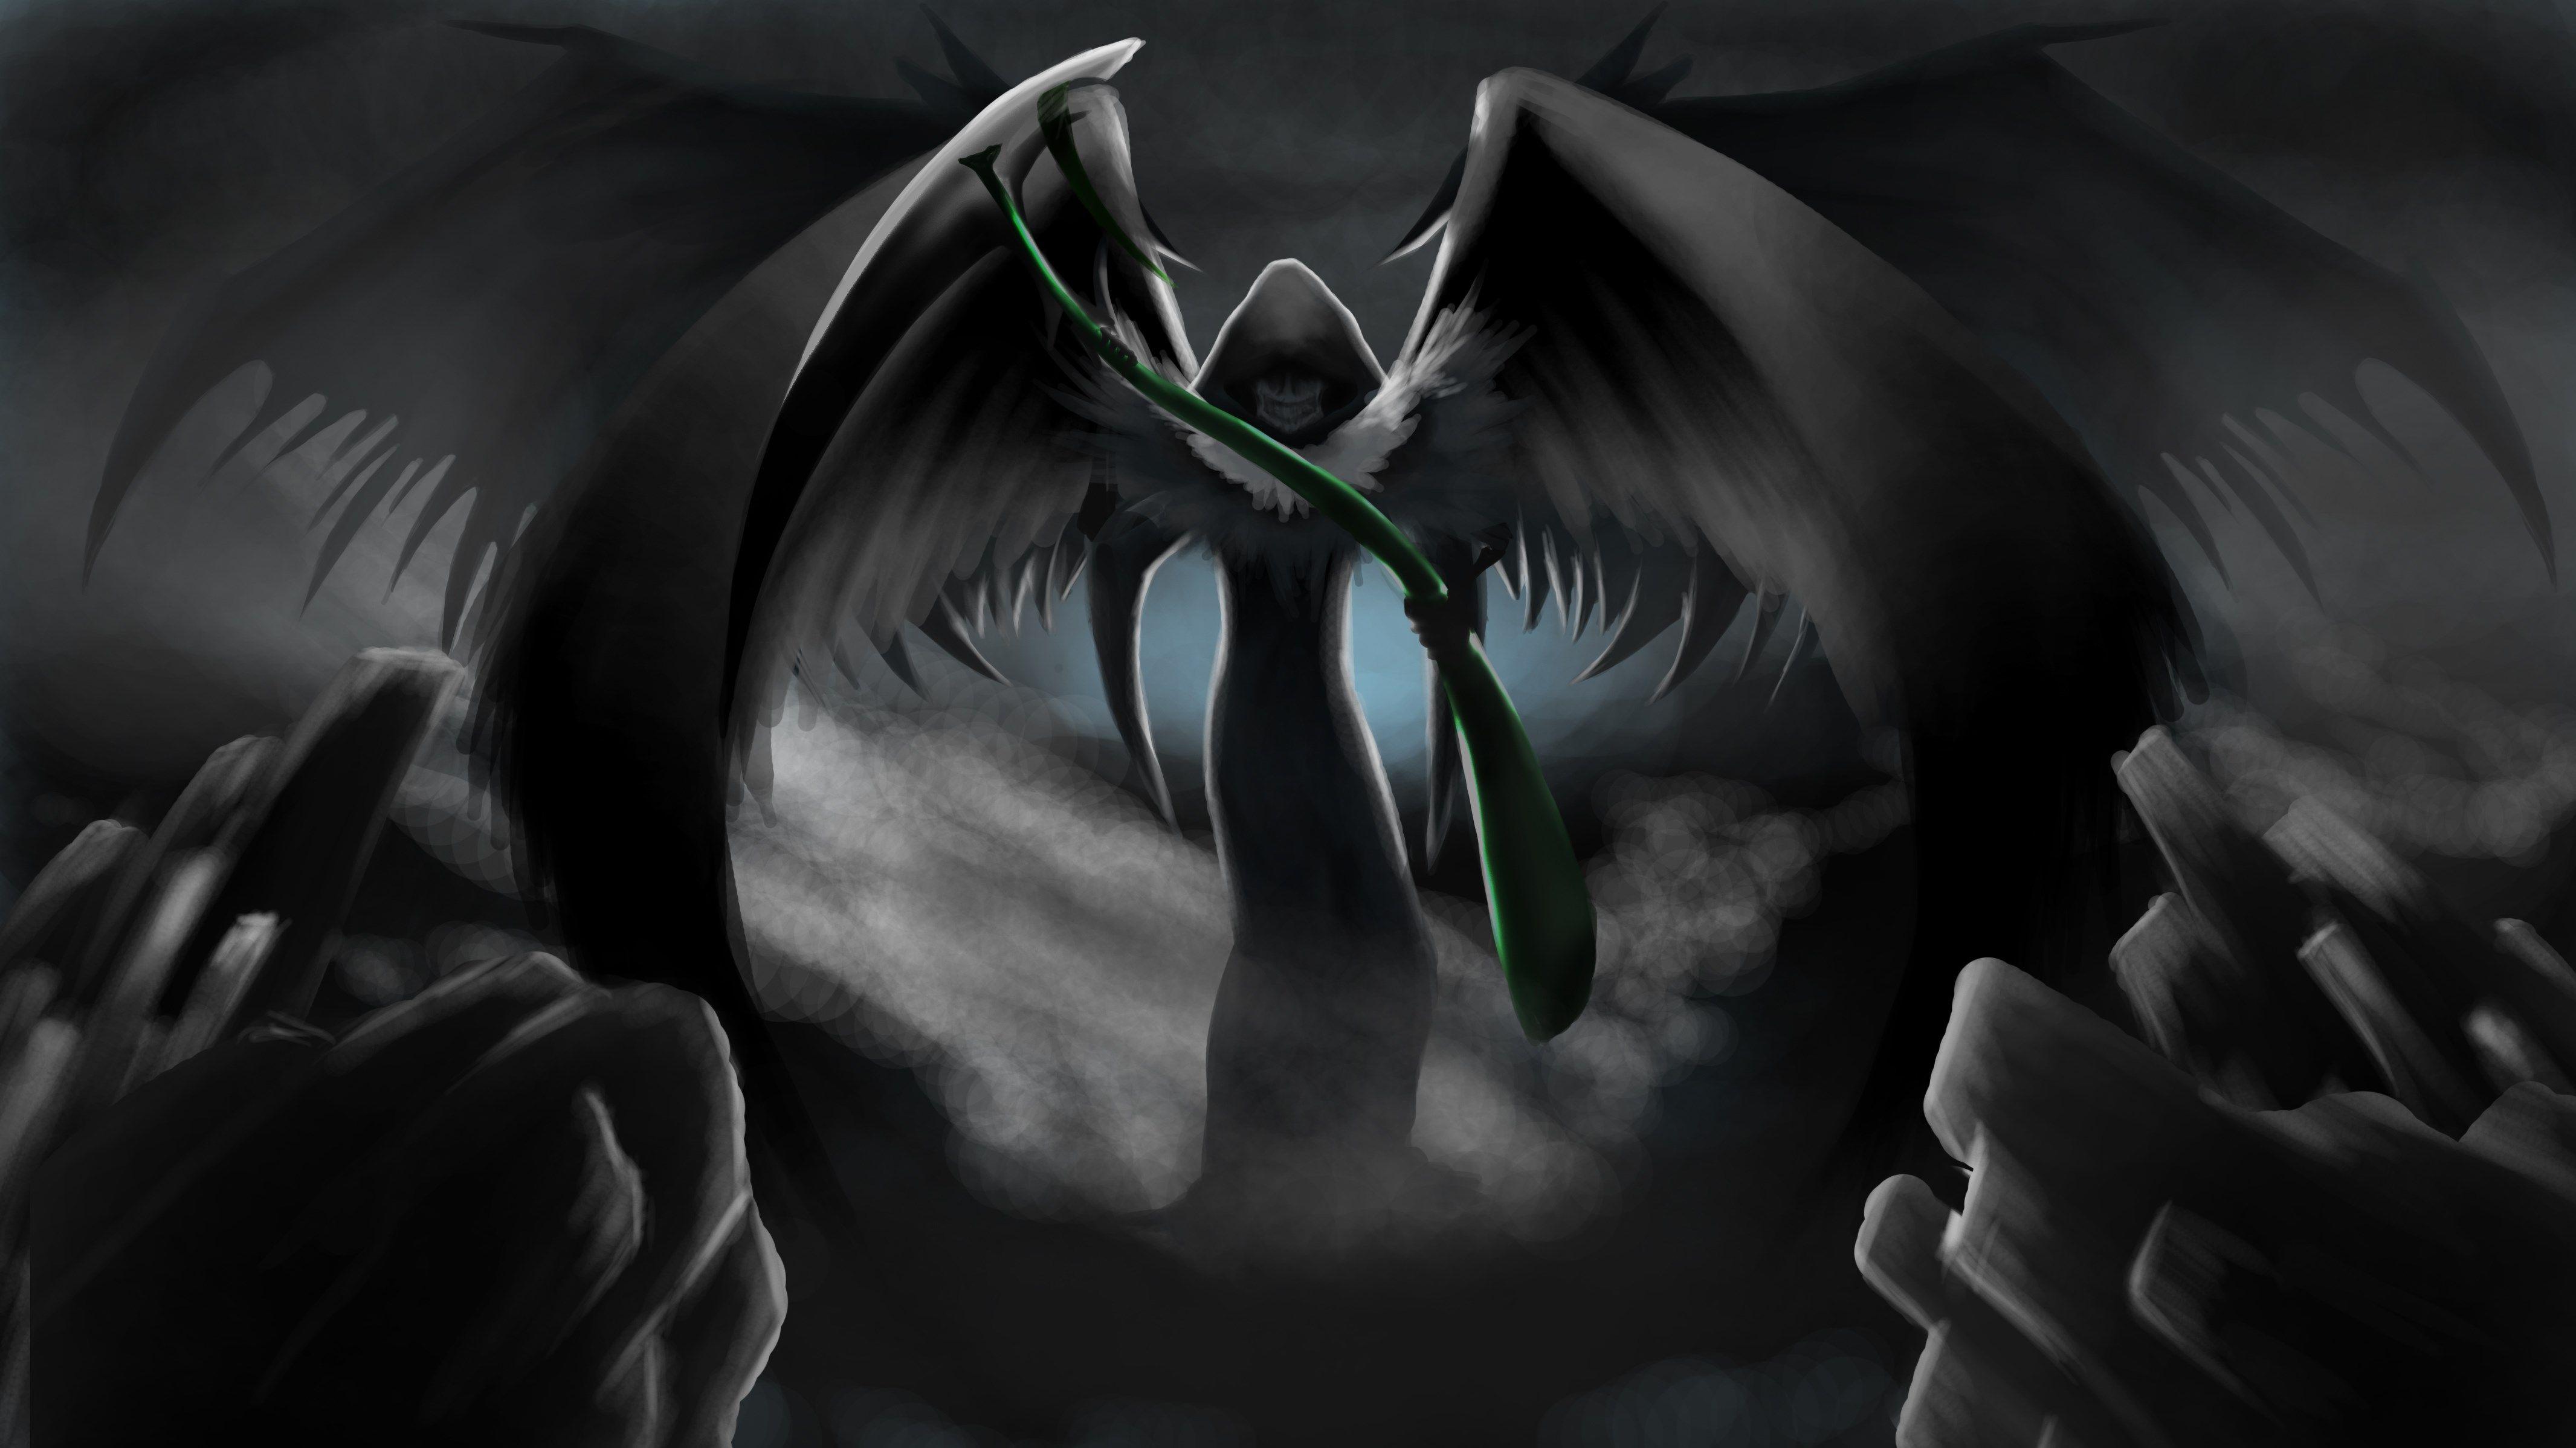 4k Grim Reaper Hd Wallpaper 4263x2397 Grim Reaper Pictures